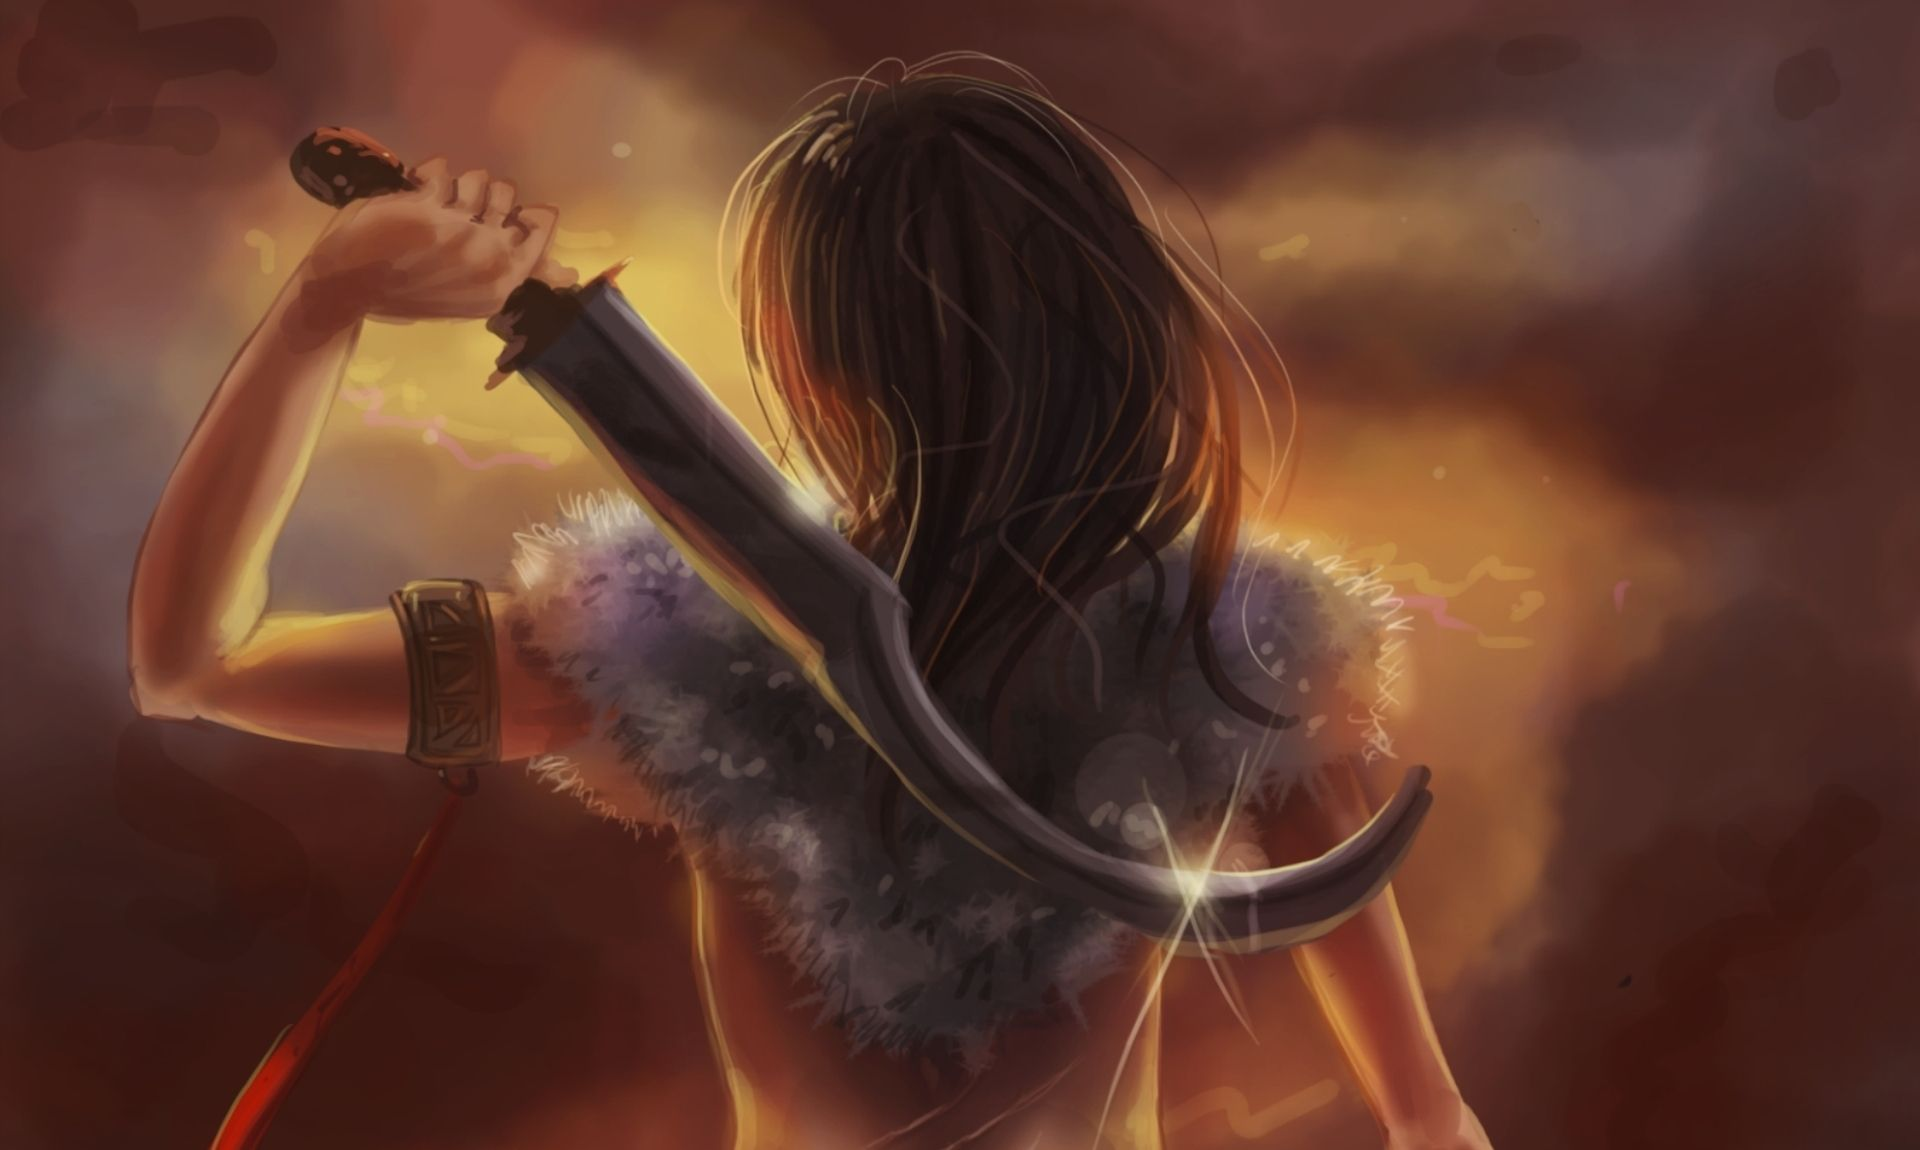 Download Wallpaper Girl Art Hammer Sword HD Background